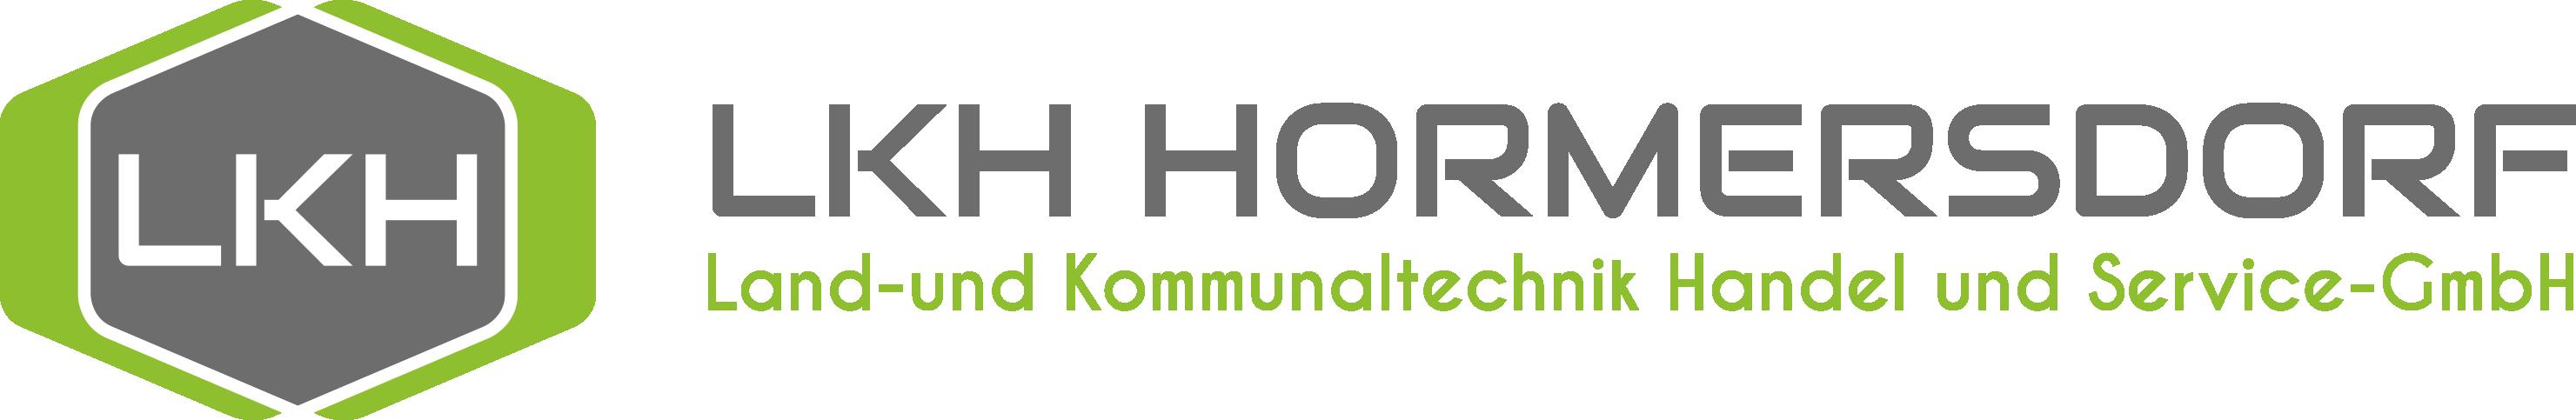 LKH Hormersdorf